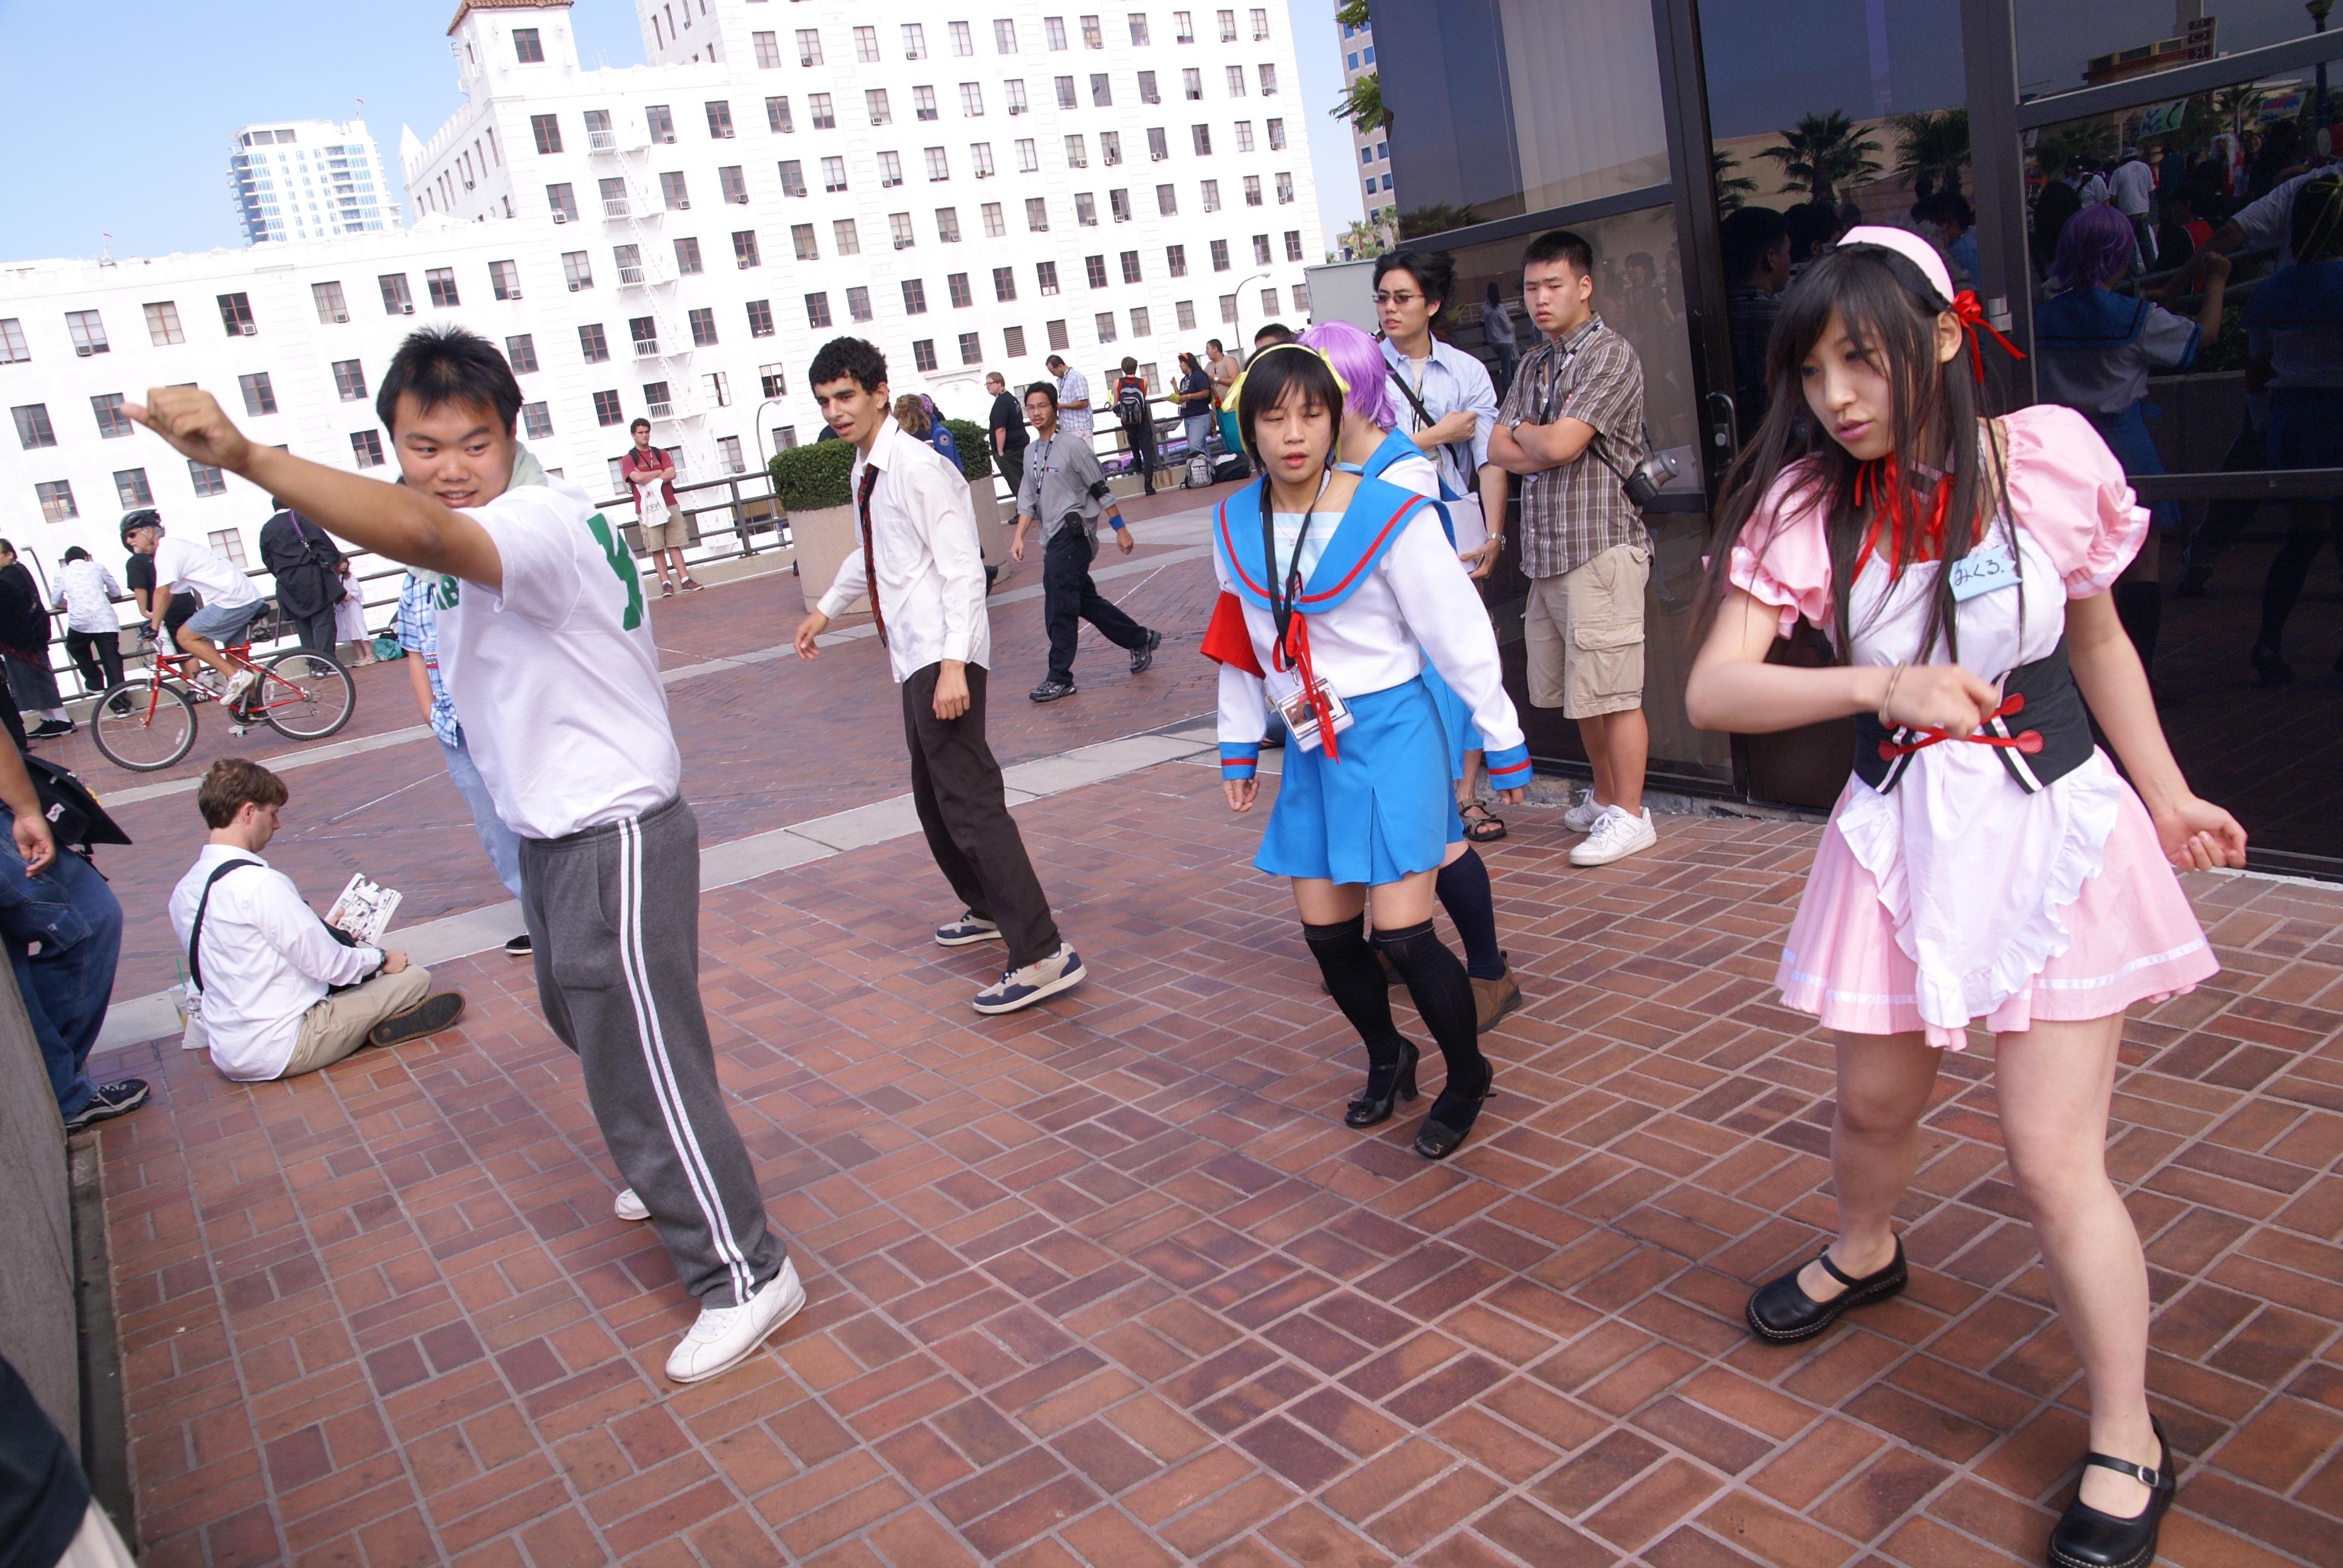 Fileharuhi Suzumiya Cosplayers Dancing At Anime Expo 20070630jpg